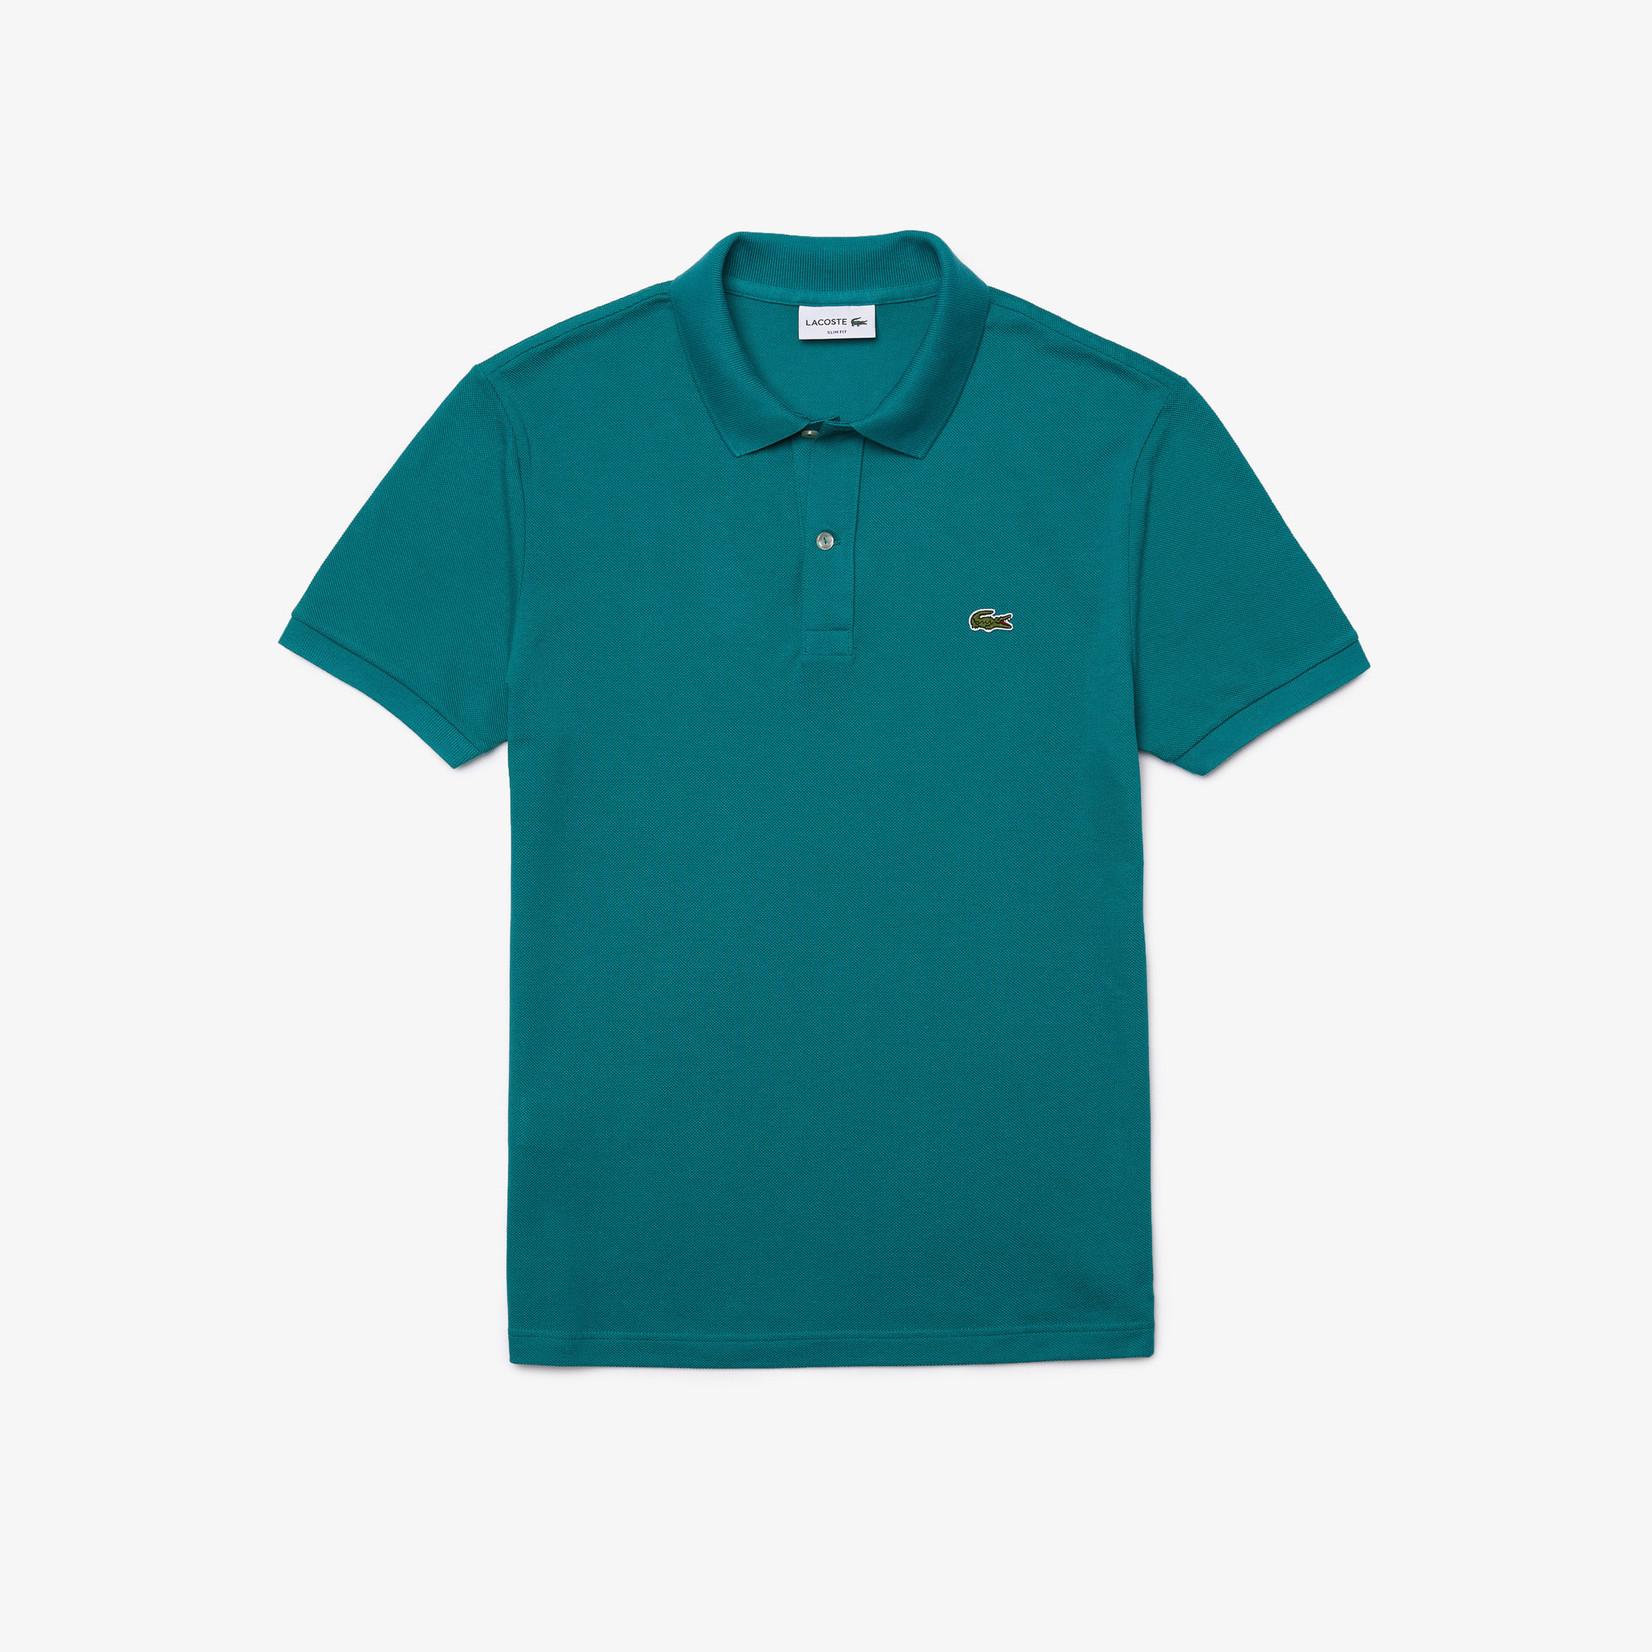 Lacoste polo korte mouw turquoise